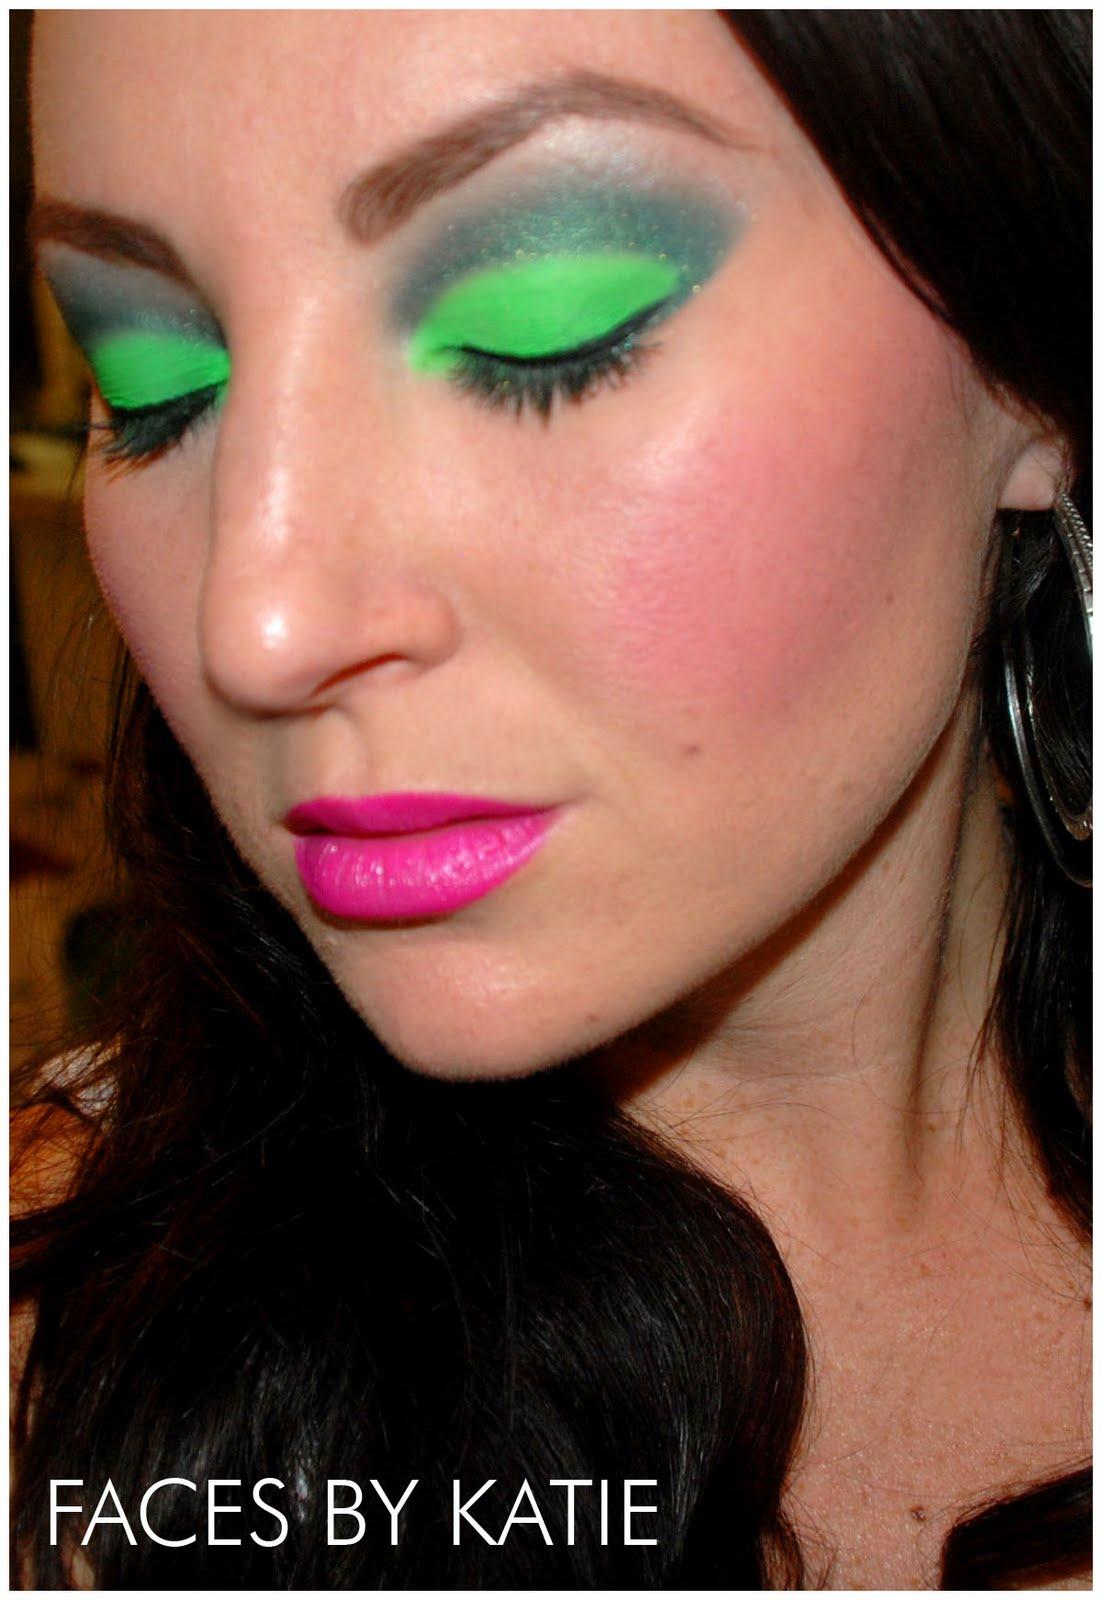 http://2.bp.blogspot.com/_8pcgliYHpmU/THsCVlYWWnI/AAAAAAAAAhQ/KU-Skv3l69U/s1600/NickiMinaj+look2.JPG